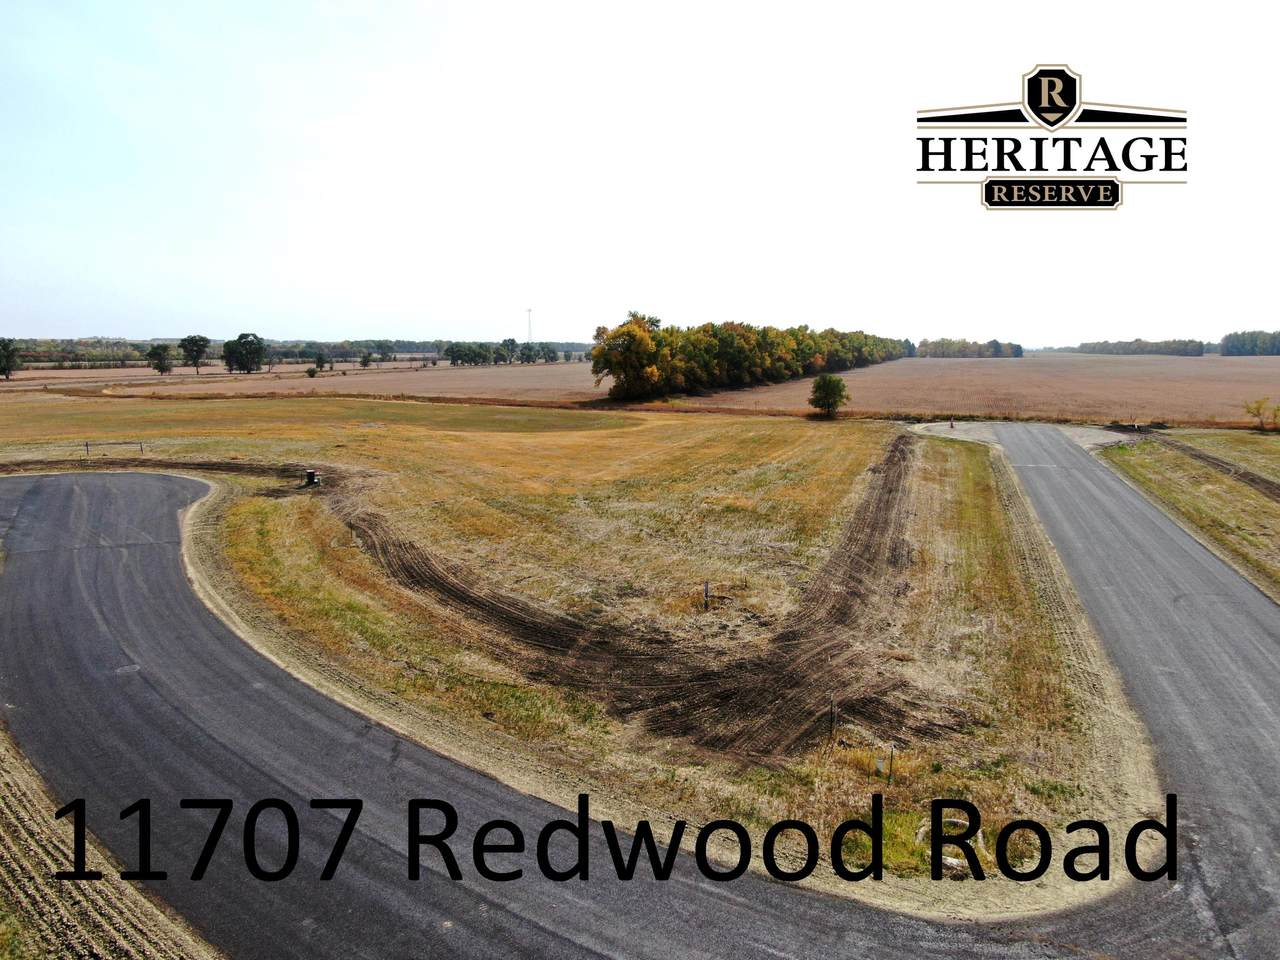 11707 Redwood Road - Photo 1